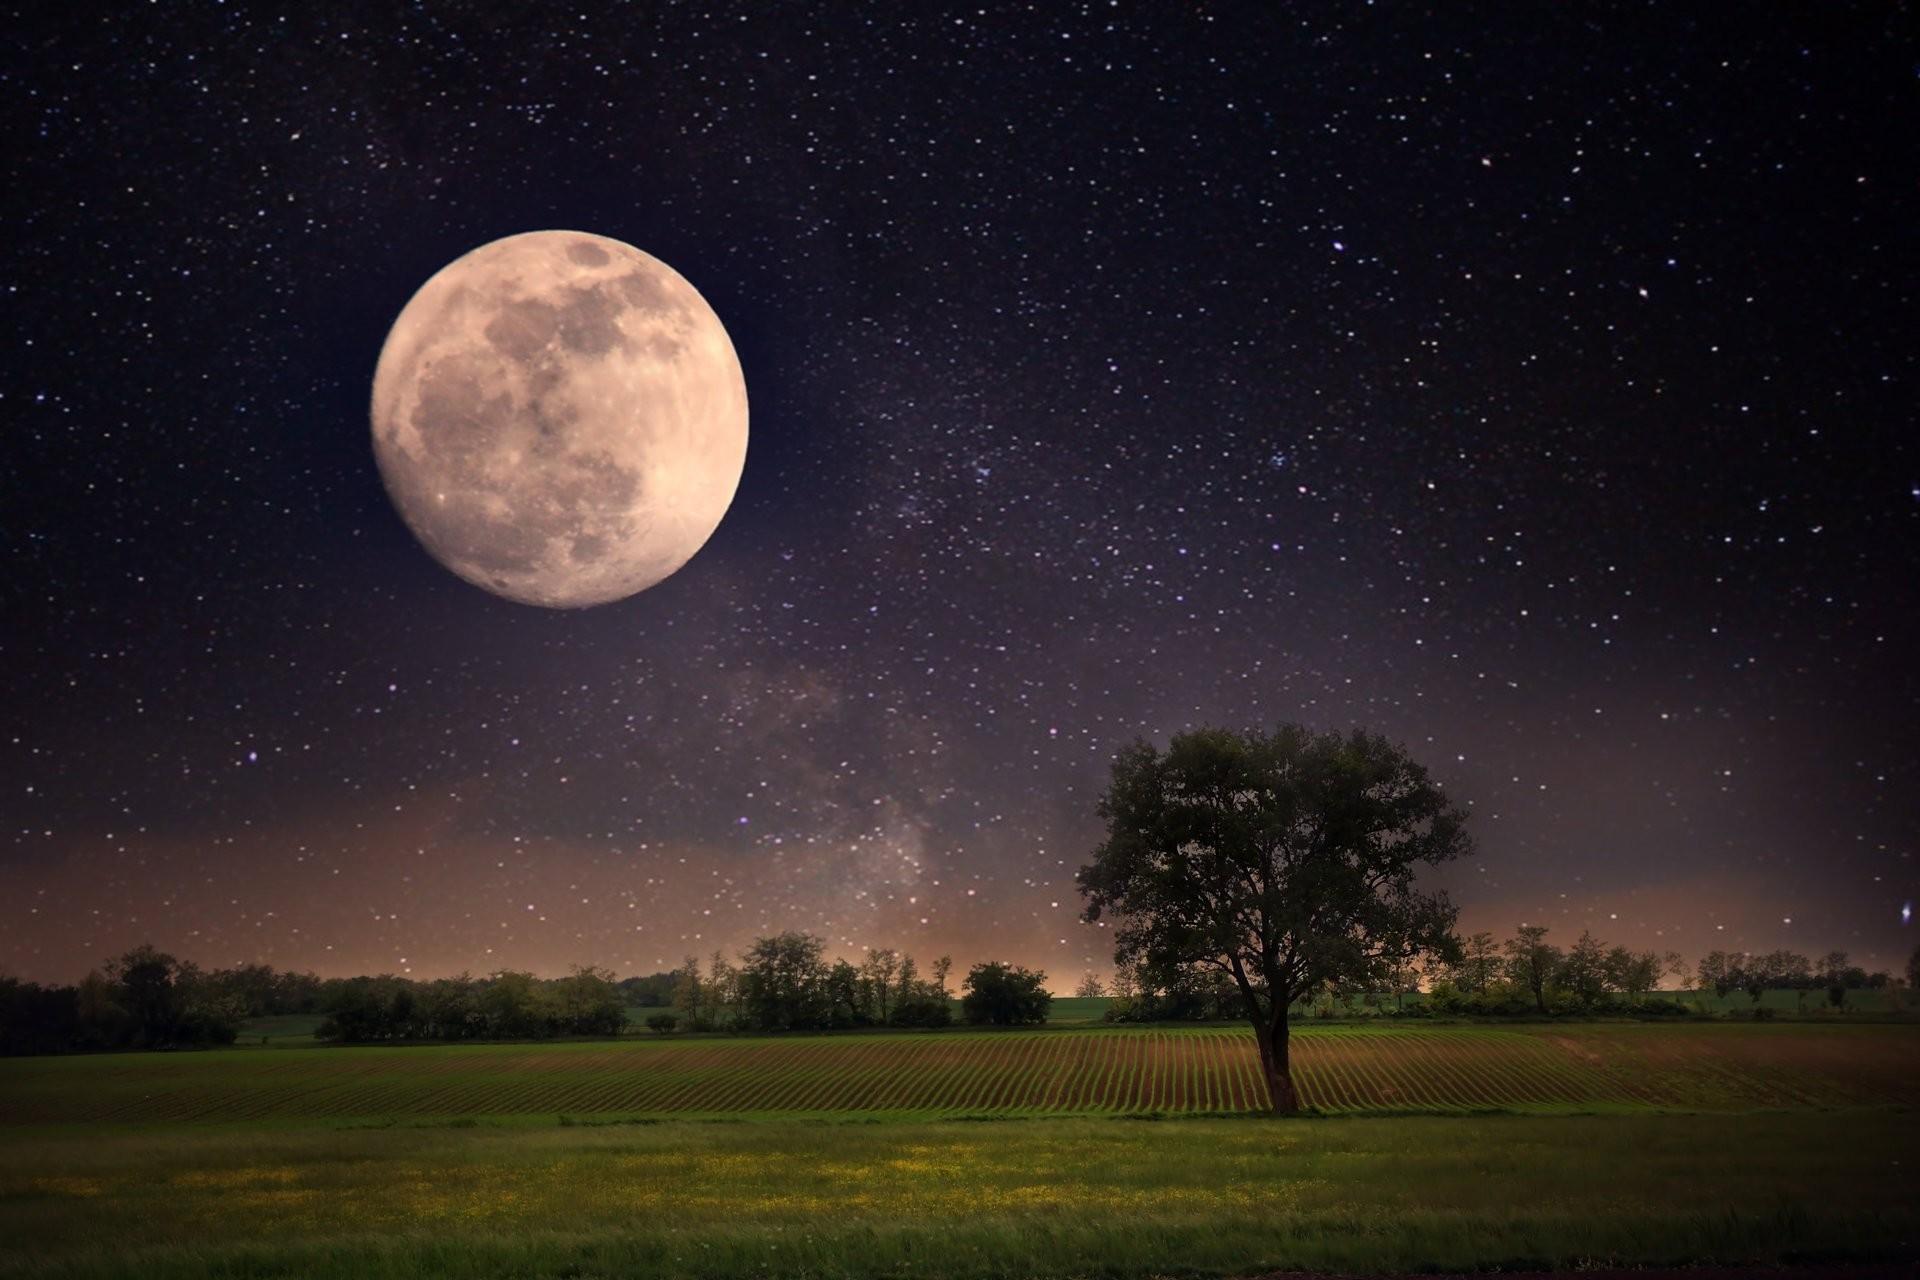 moon night landscape stars full moon sky beautiful scene nature lonely tree  landscape moon night landscape